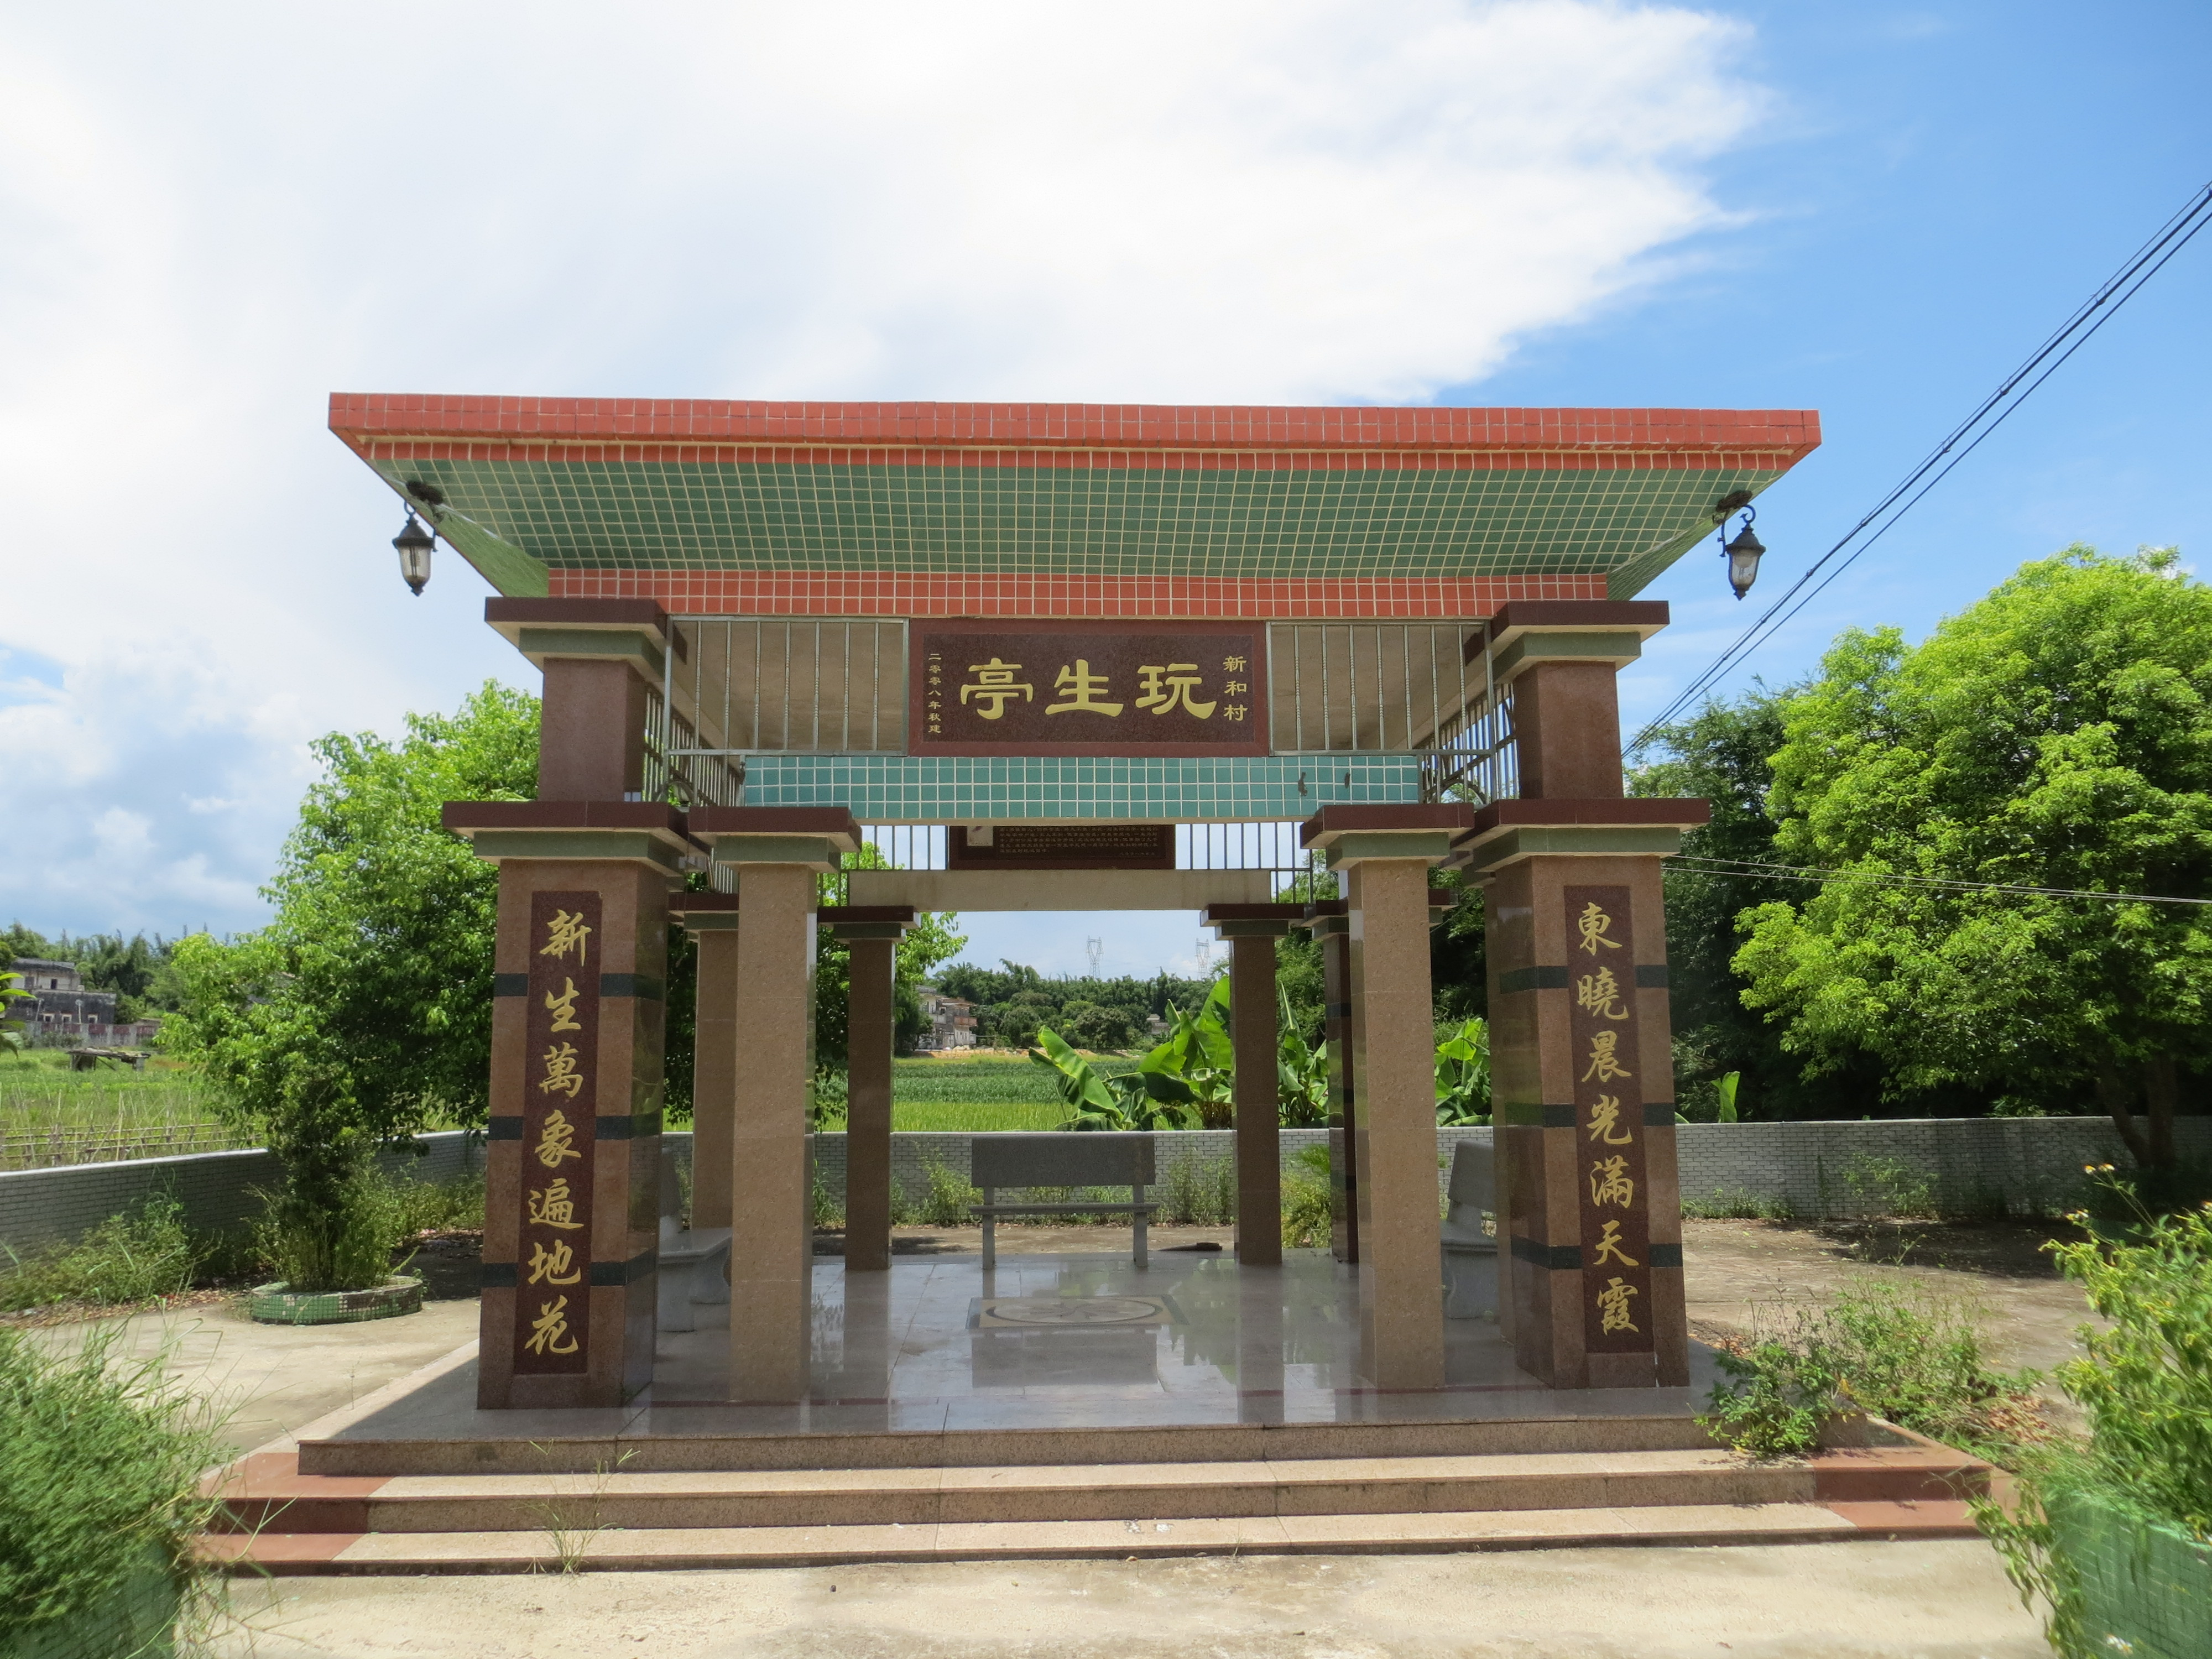 Taishan villages mom entry gazebo from Tom Louie dad 2016-06-26 009